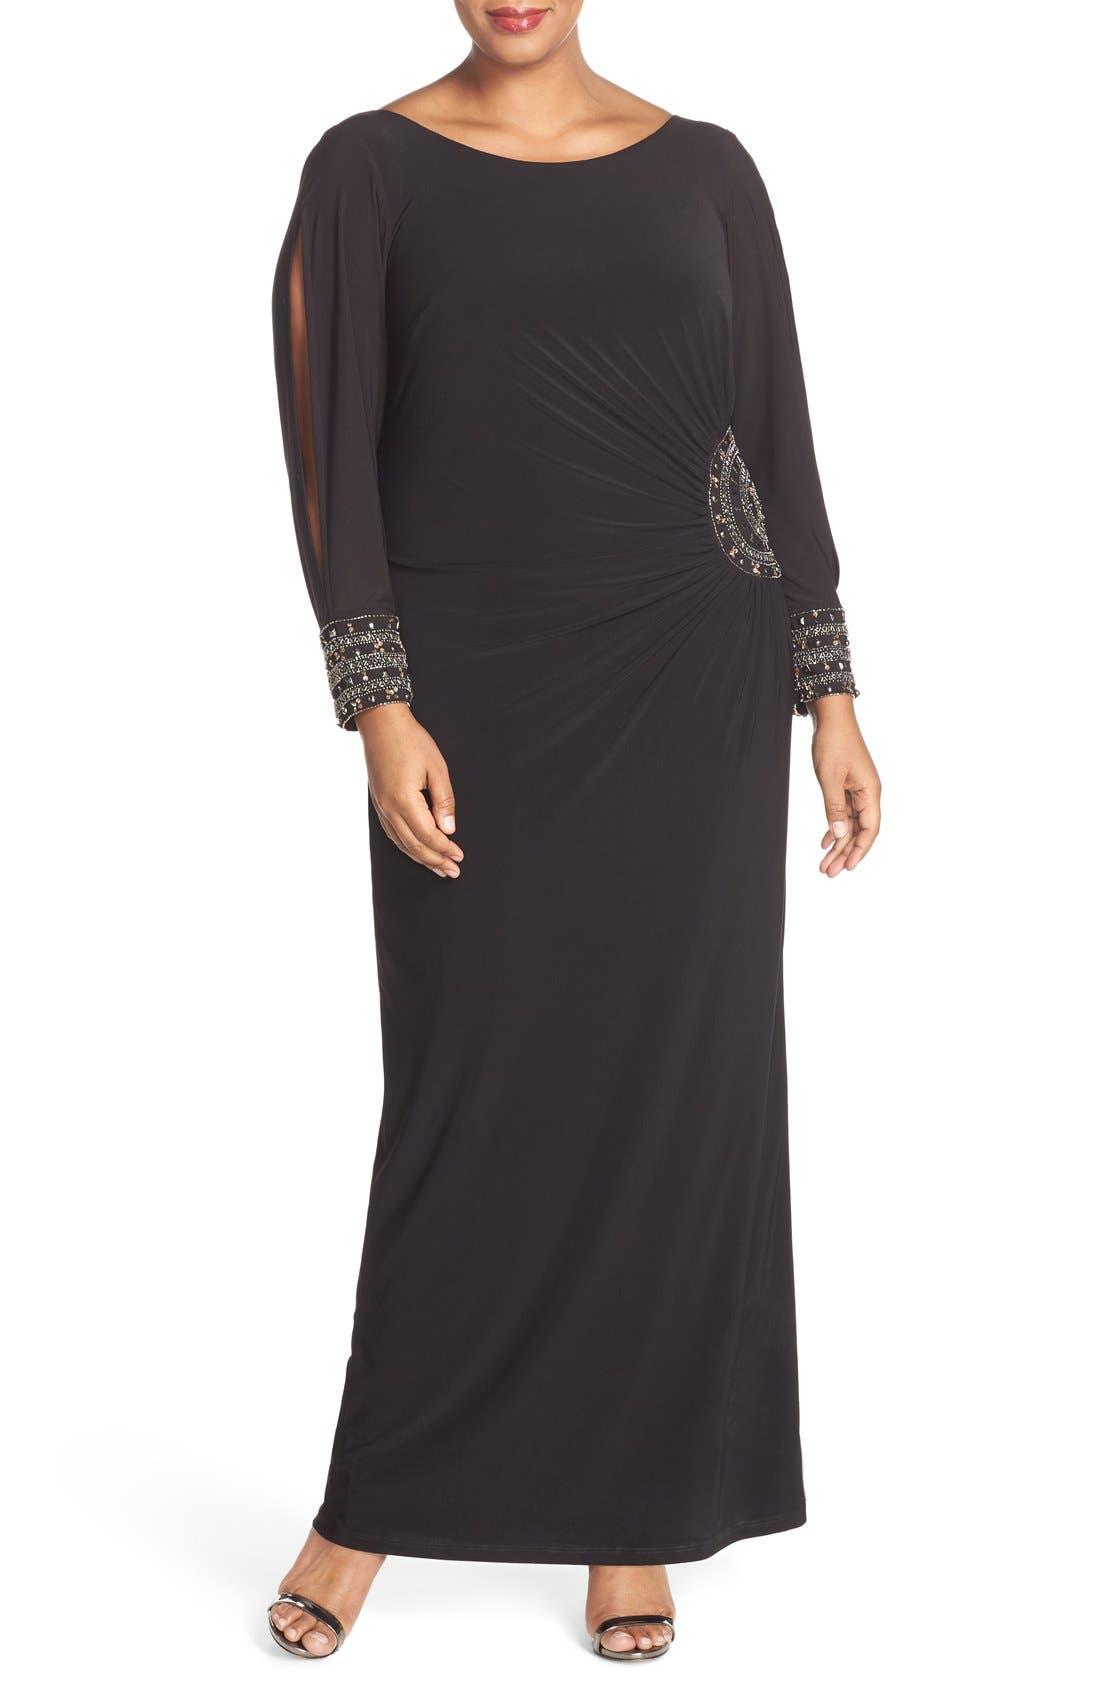 Embellished Stretch Jersey Long Dress,                             Main thumbnail 1, color,                             BLACK/ GOLD